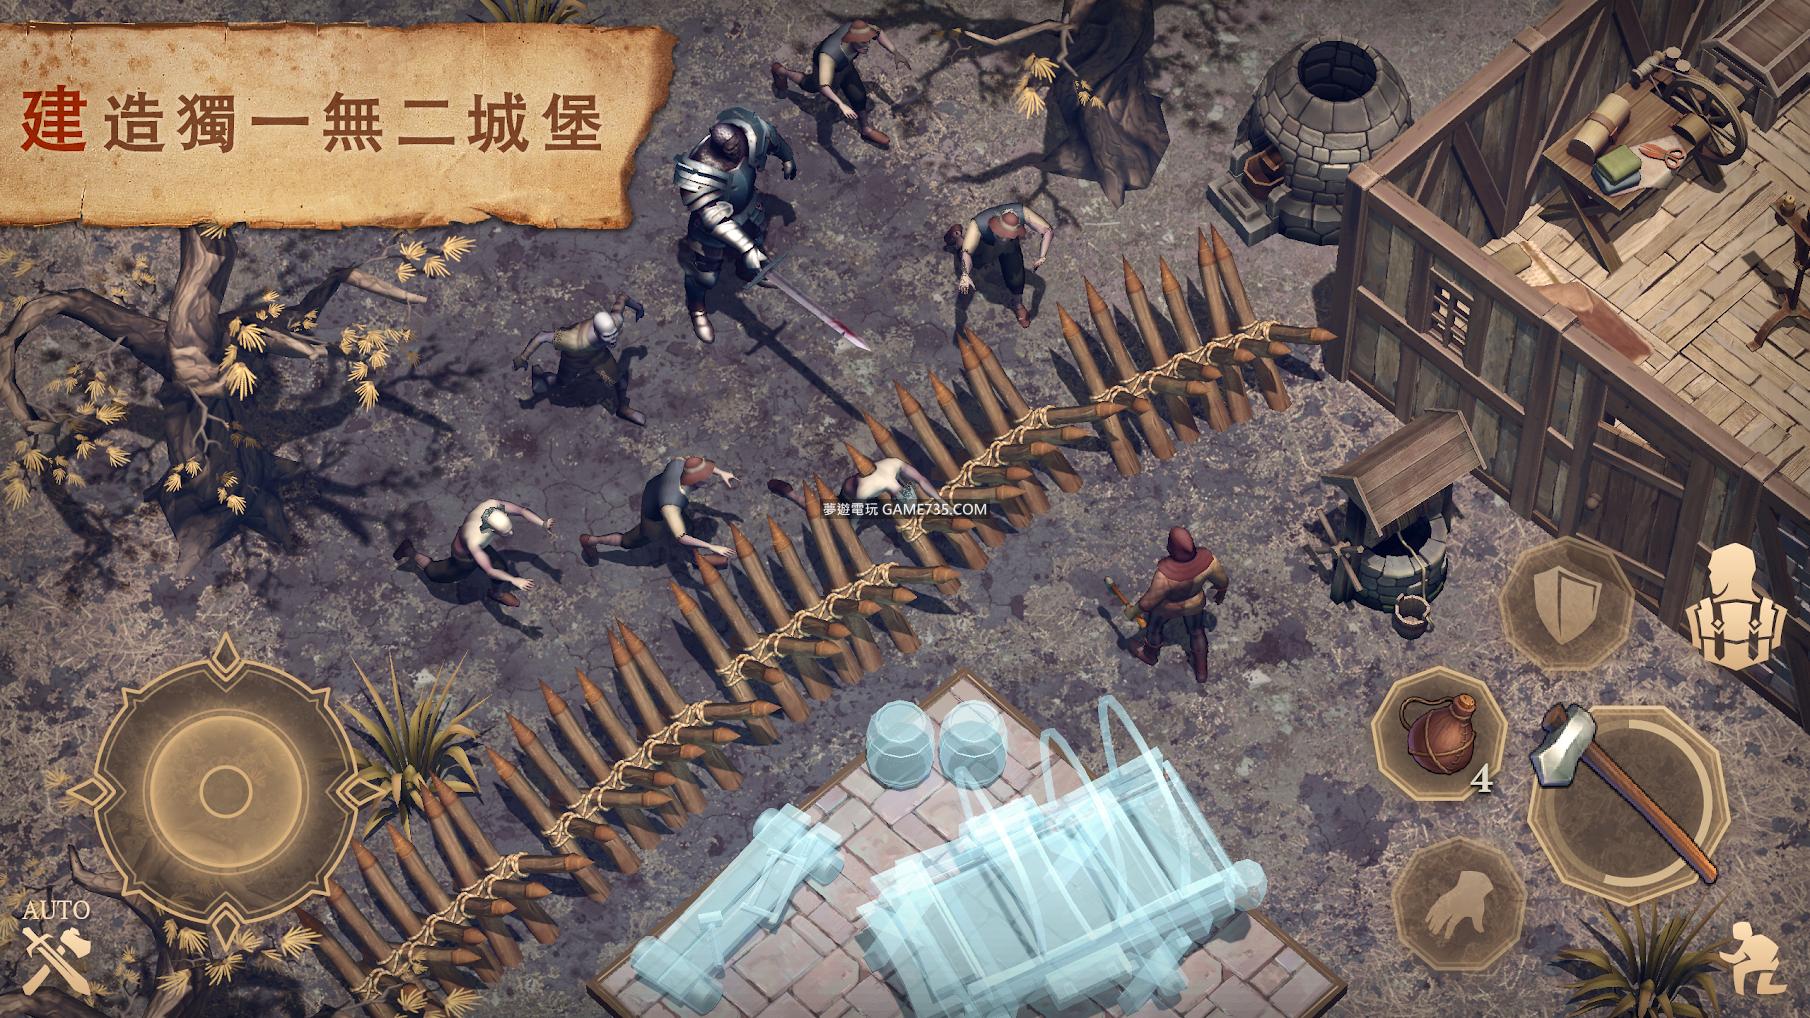 [修改版][生存+冷酷靈魂]Grim Soul: Dark Fantasy Survival V2.3.3 多種修改+中文